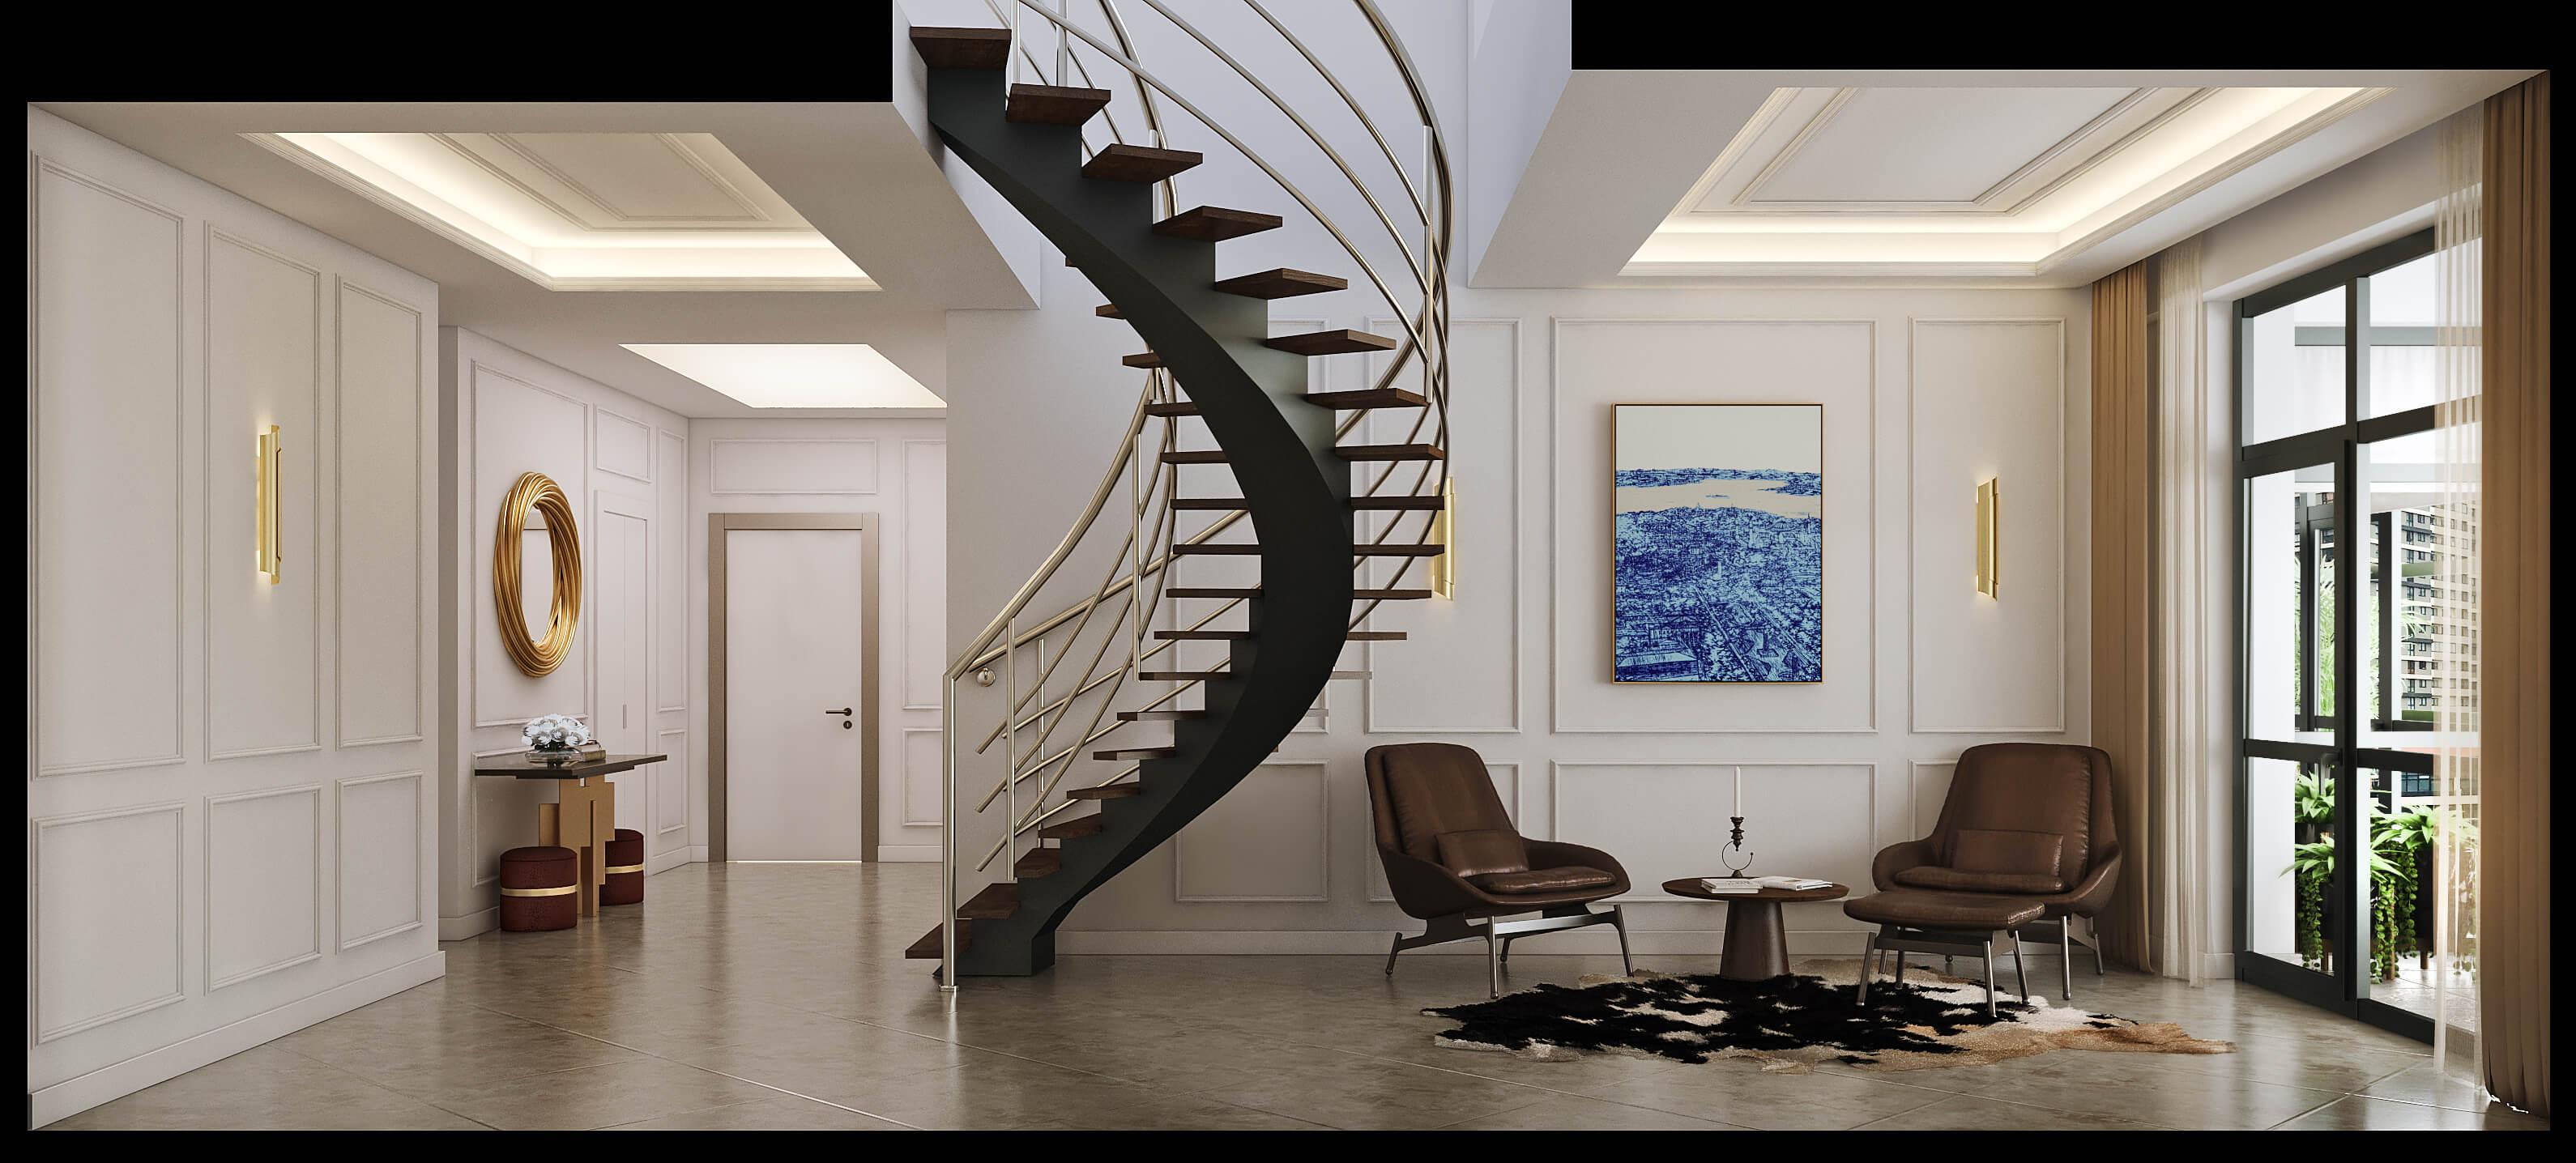 home decoration 4480 Incek Prestij Dublex Apartment Residential